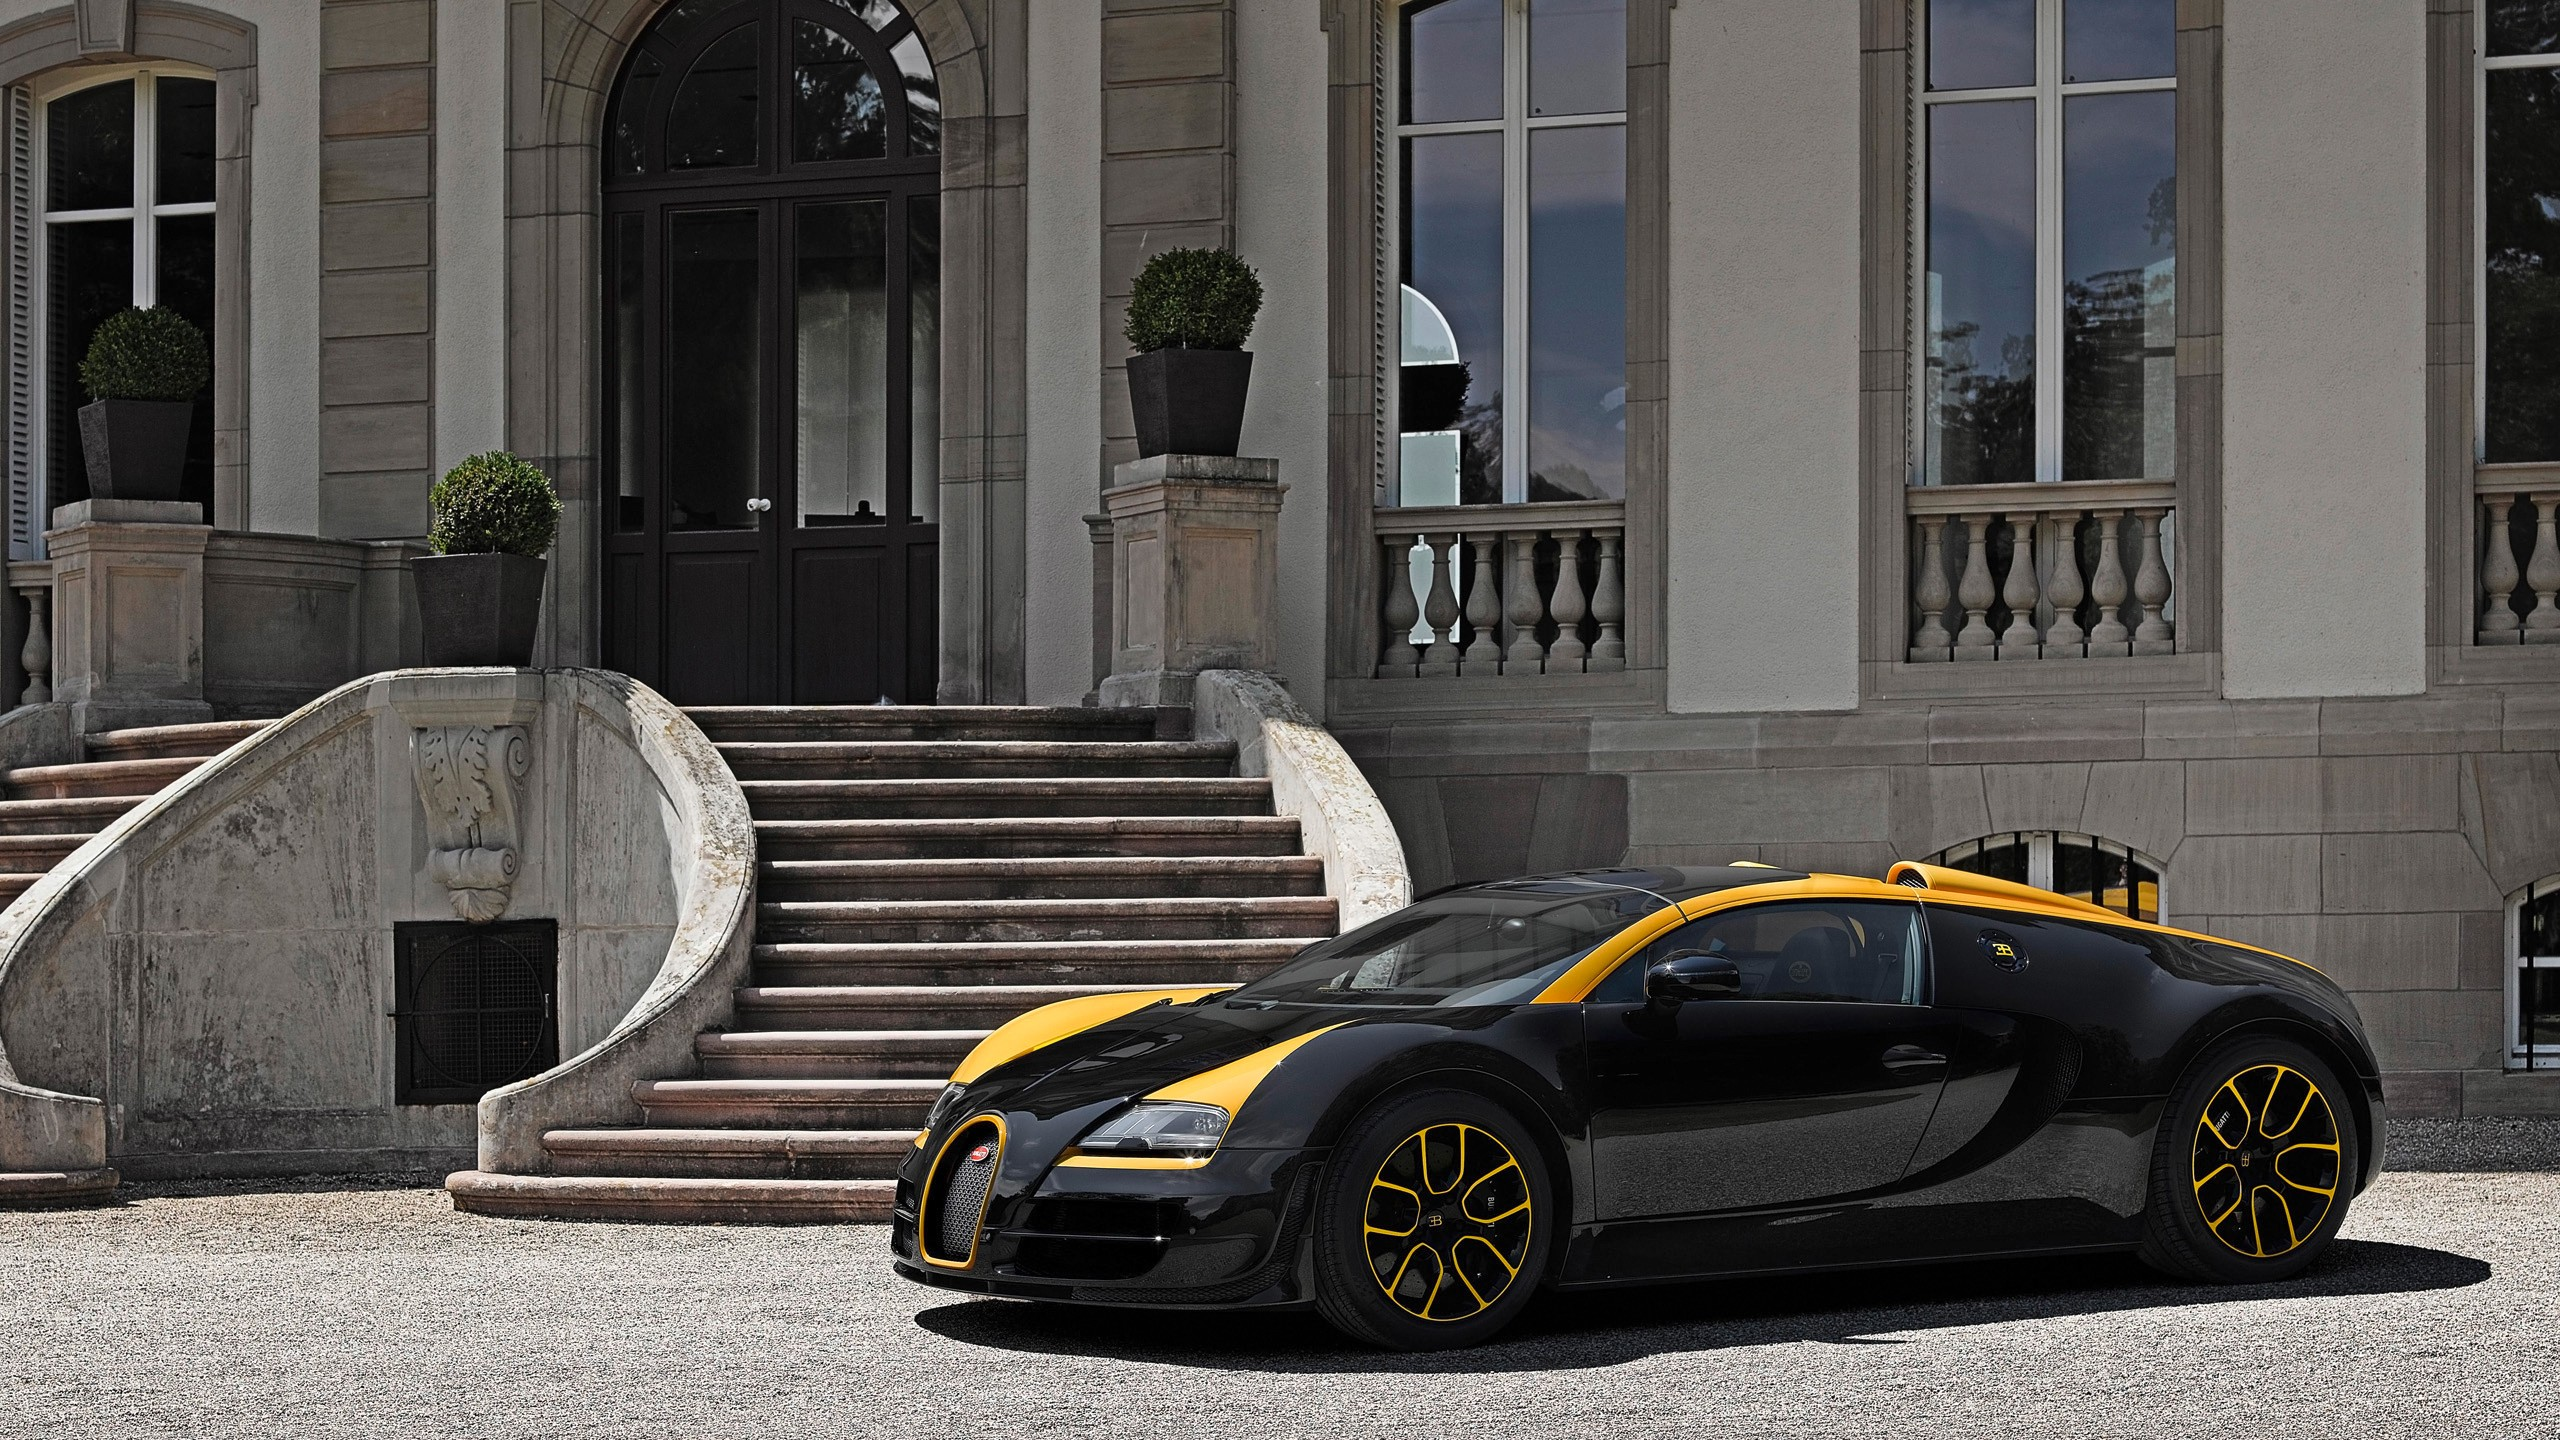 2014 bugatti veyron grand sport vitesse 1 of 1 wallpaper. Black Bedroom Furniture Sets. Home Design Ideas